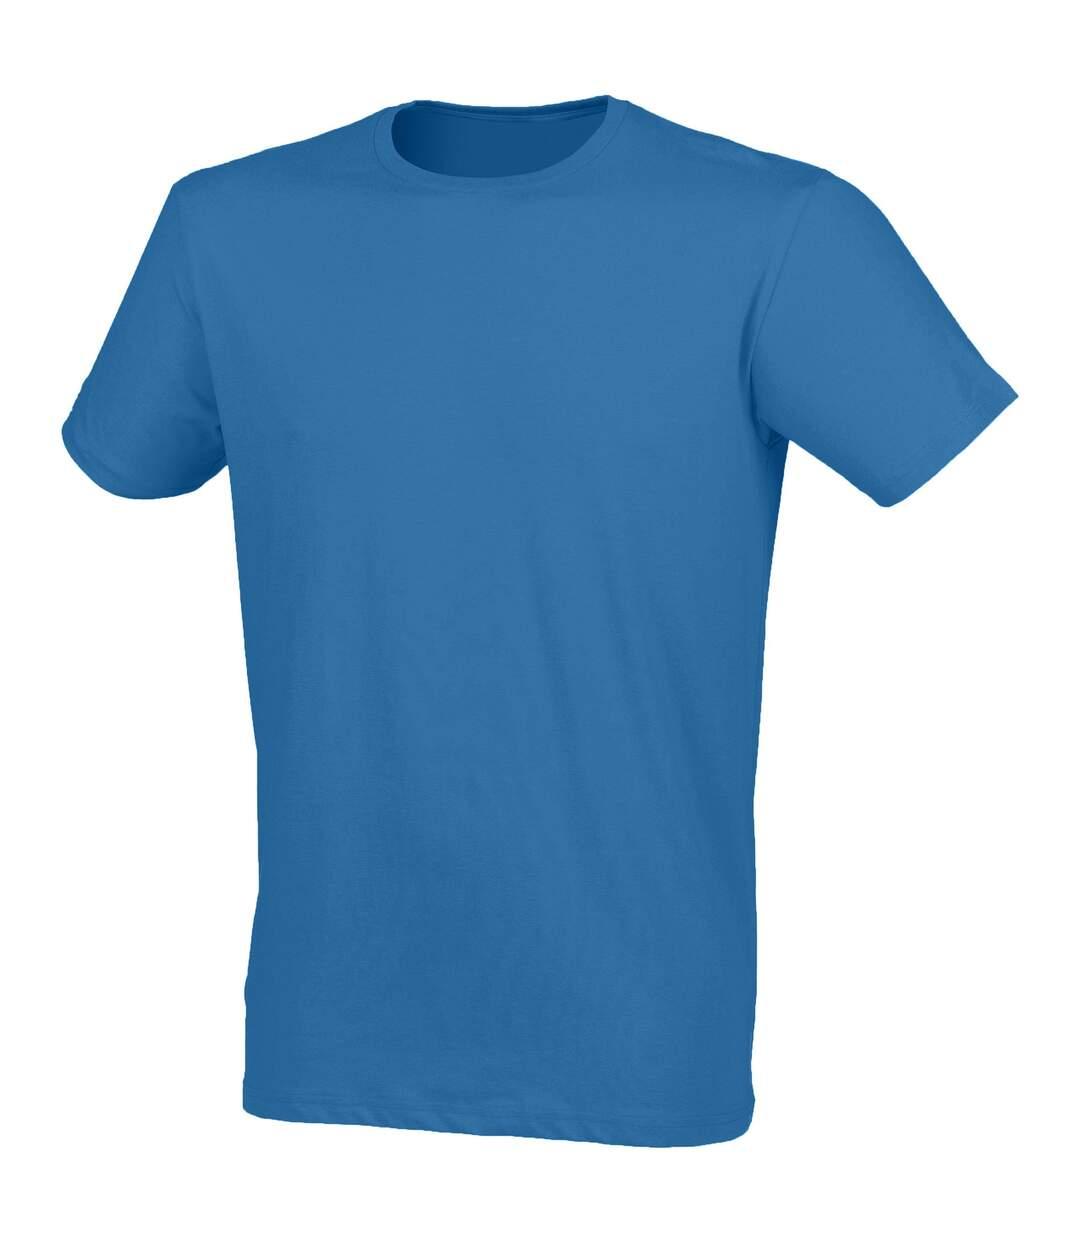 Skinni Fit - T-shirt manches courtes FEEL GOOD - Homme (Bleu) - UTRW4427